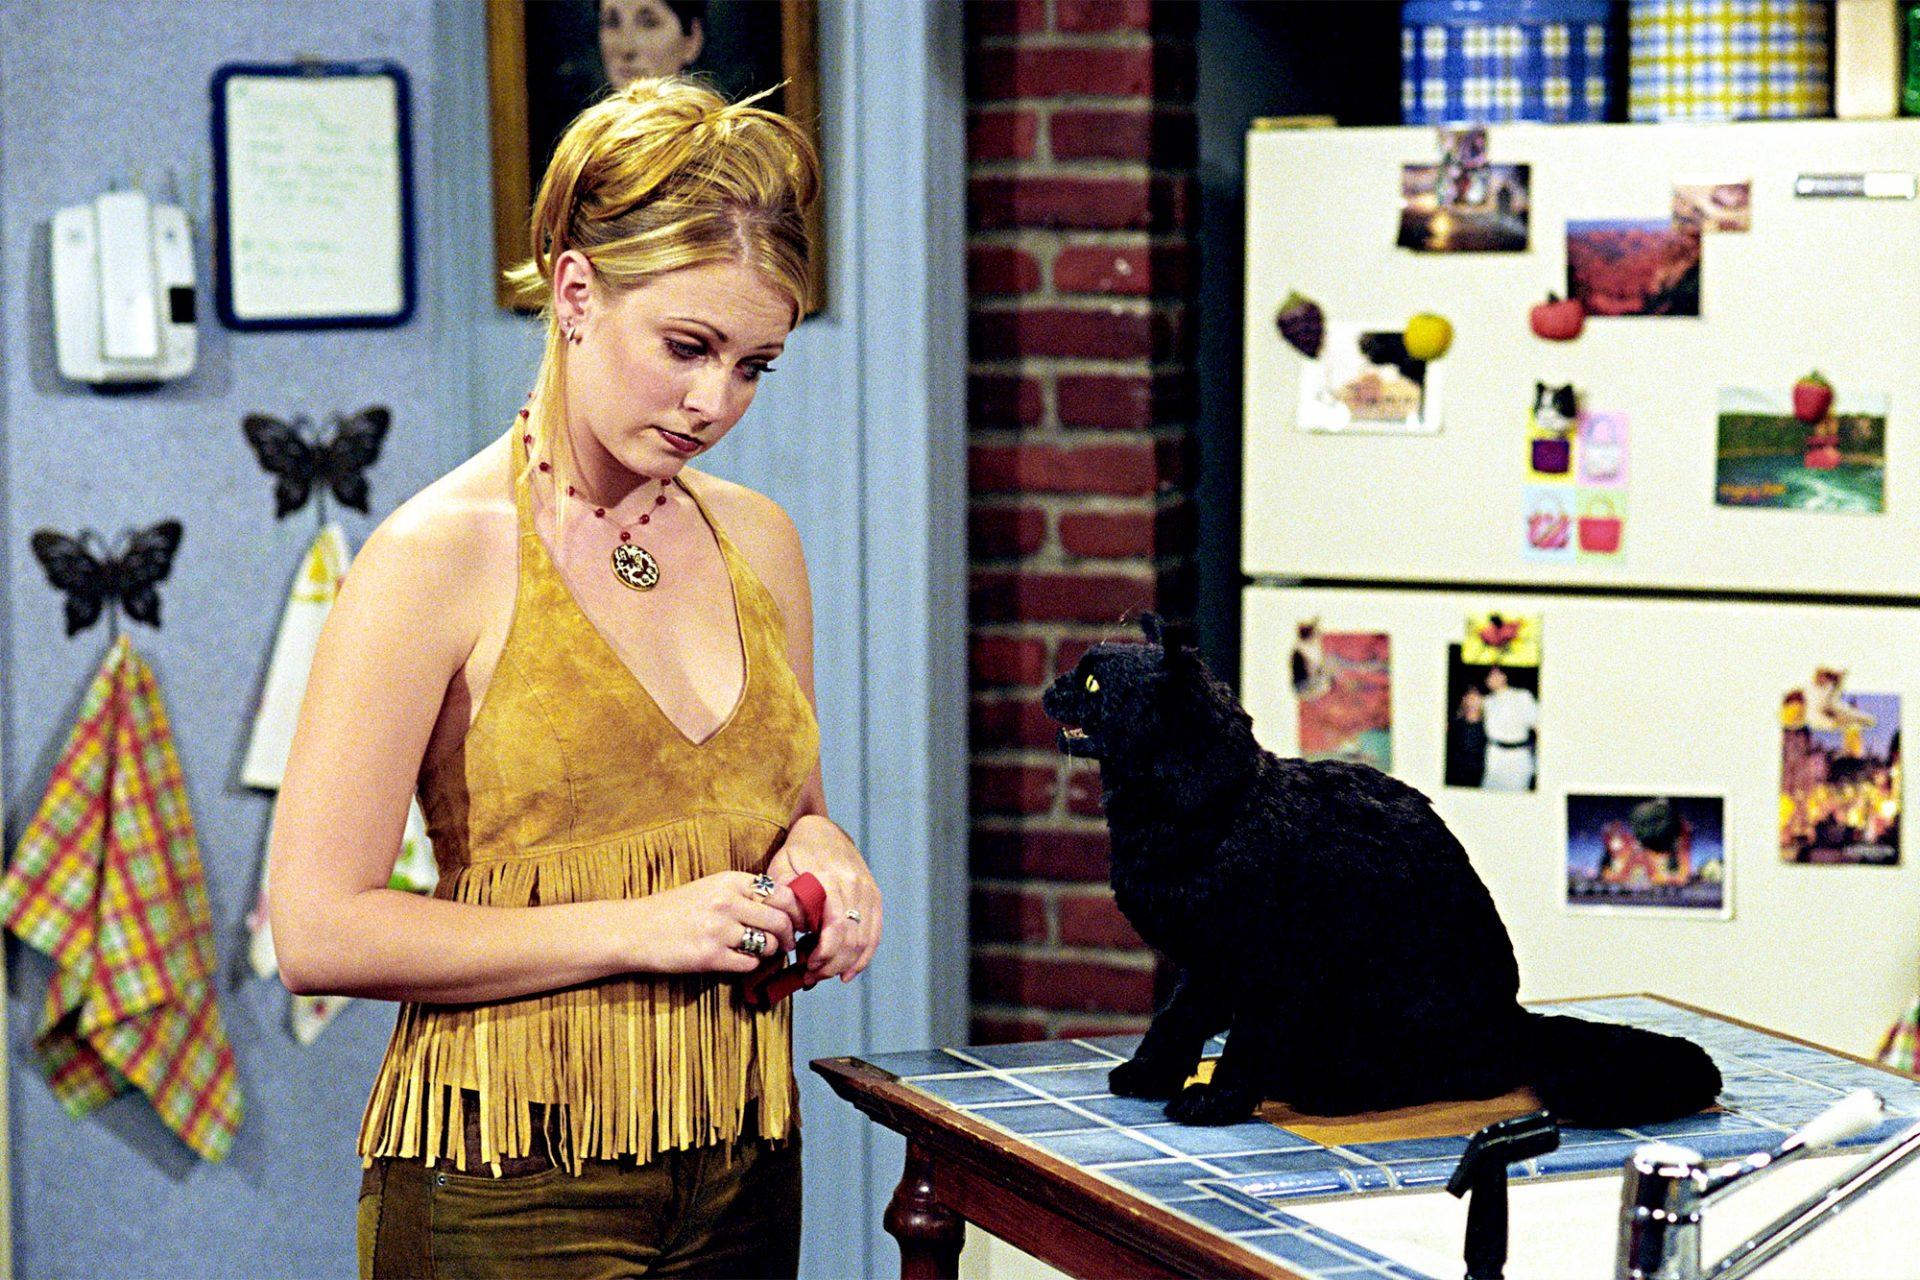 Sabrina The Teenage Witch Tanitim 22dakika Org Duck anderson and nate richert. sabrina the teenage witch tanitim